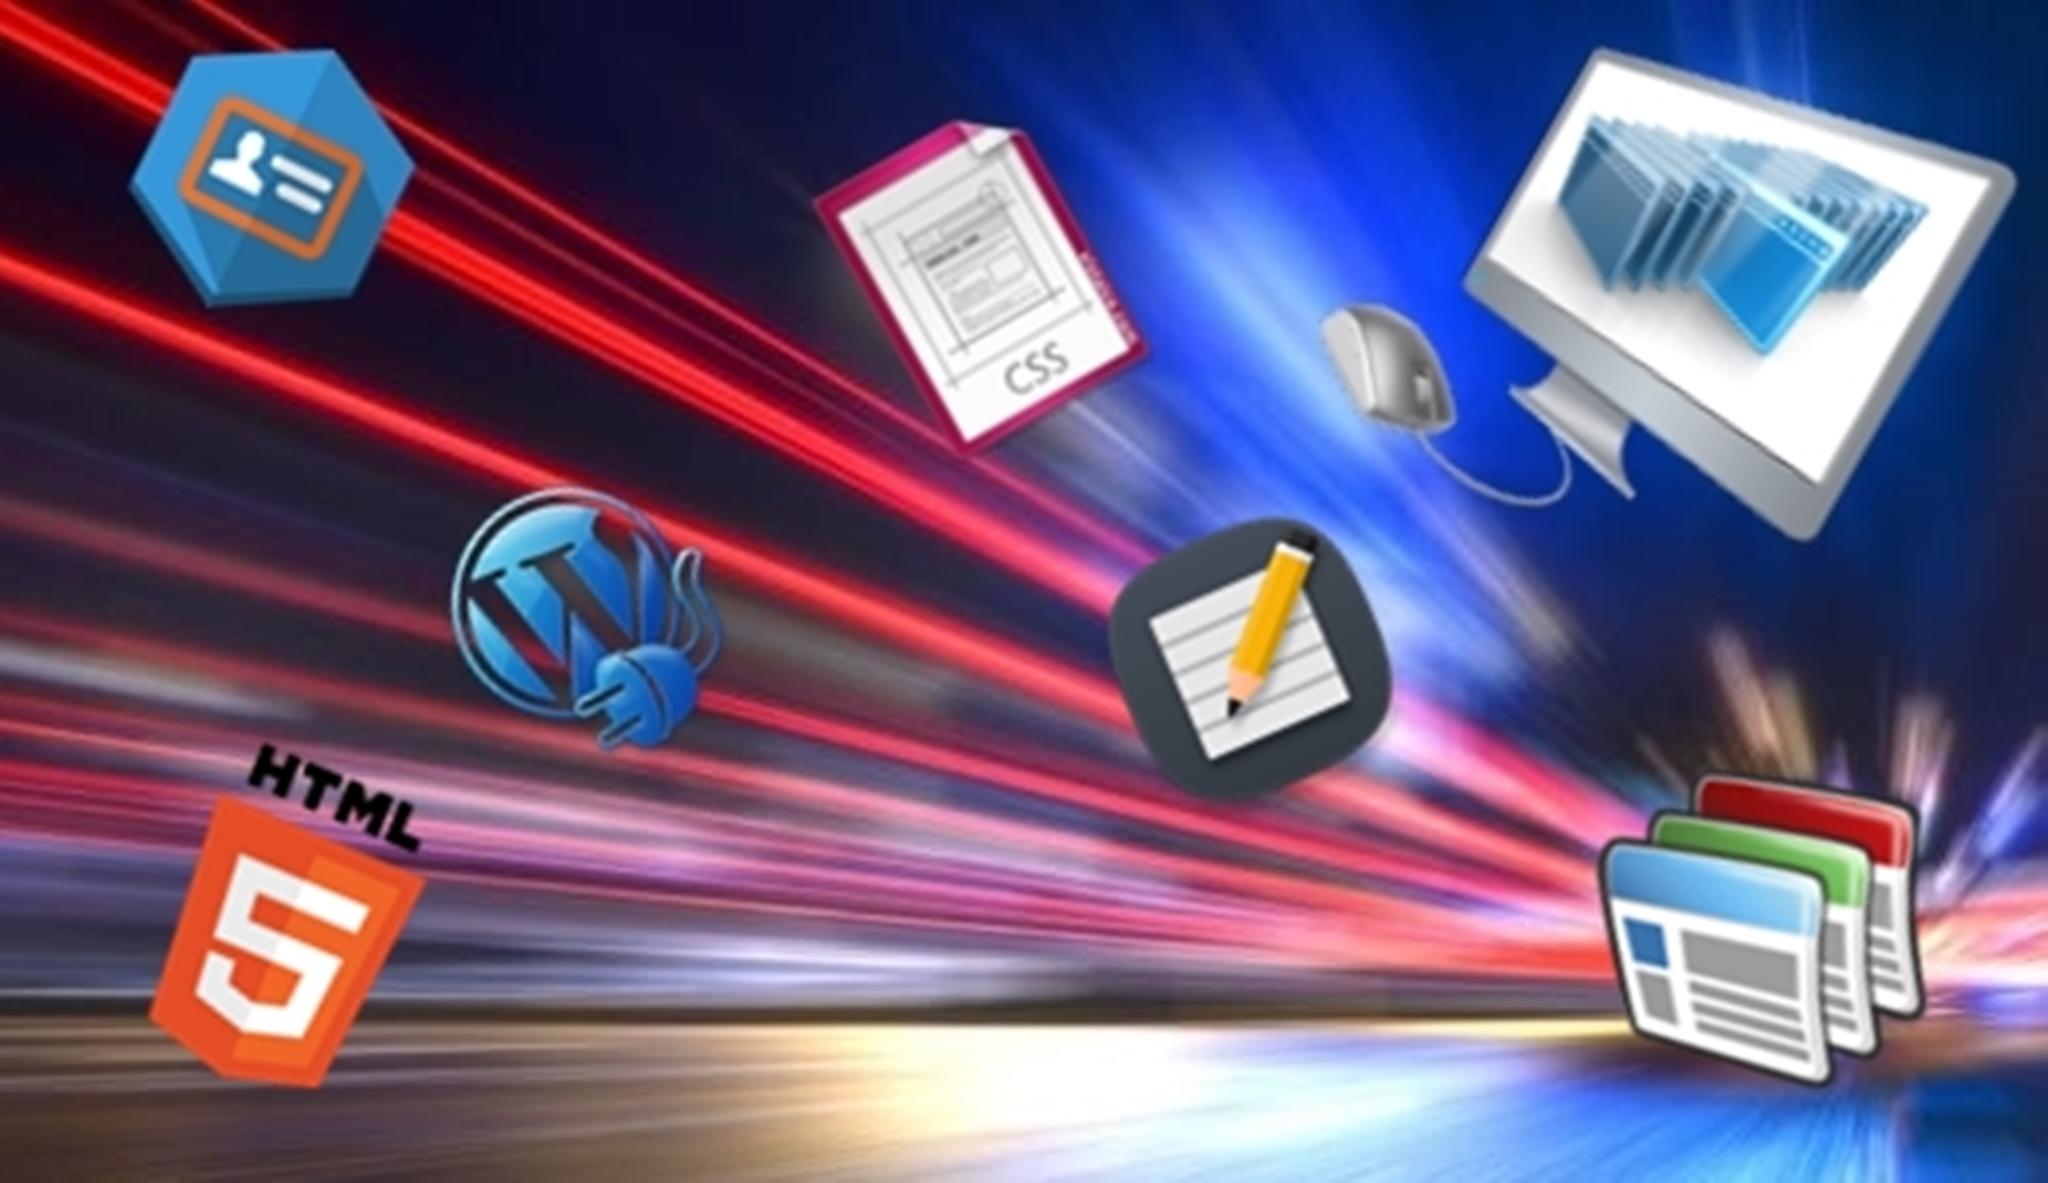 webdesign kennisbank header - Kennisbank